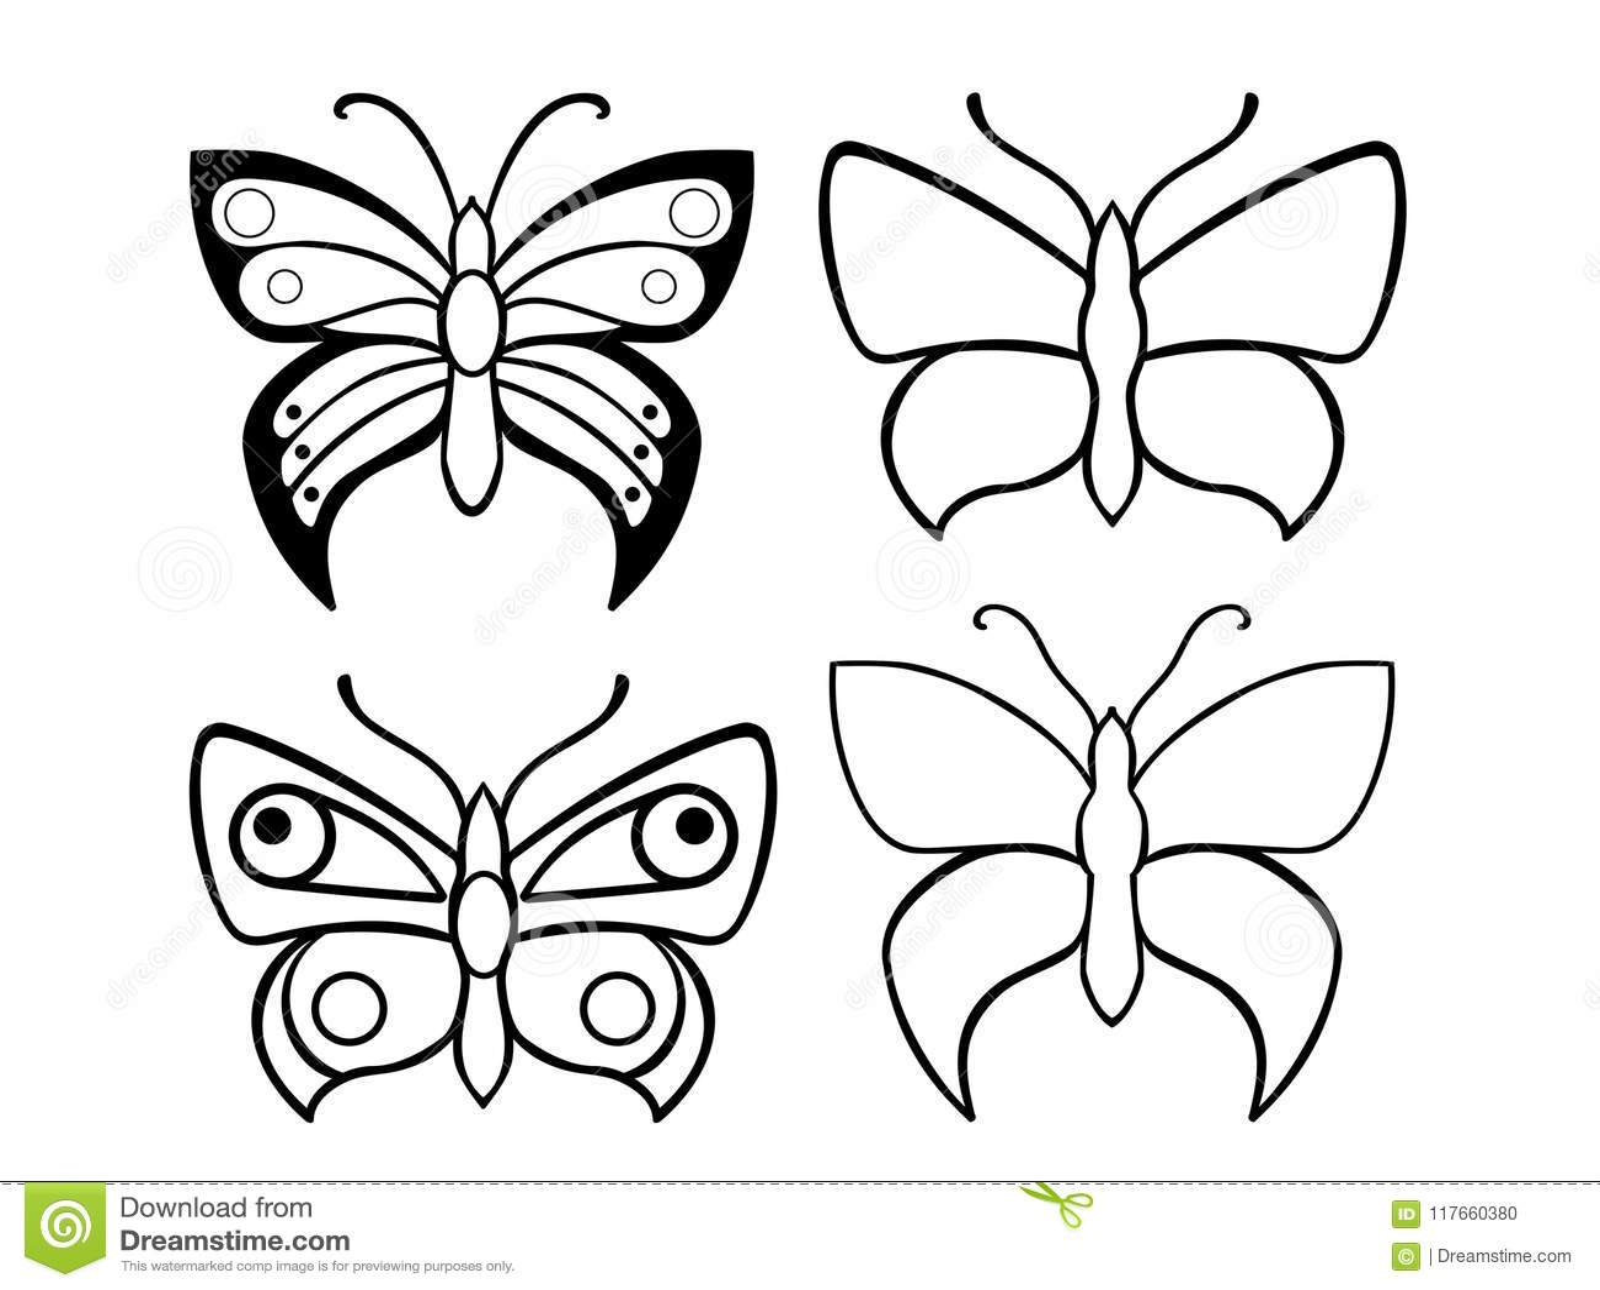 Kumpulan gambar untuk Belajar mewarnai: Plantillas Dibujos